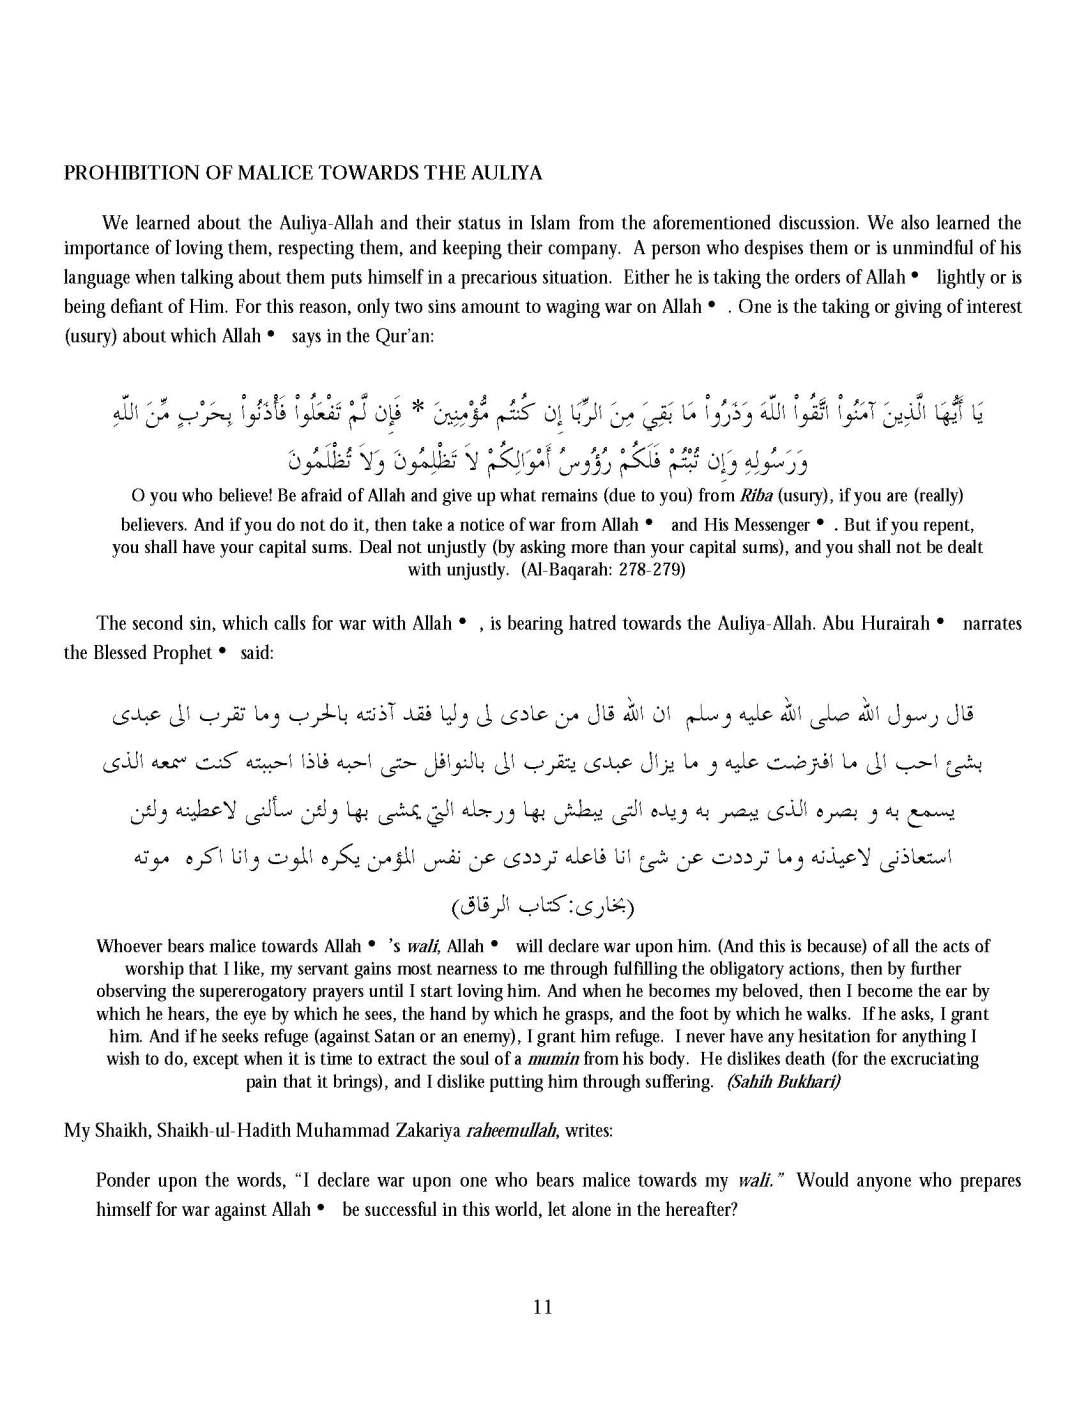 ConsequencesOfDebasingAuliyaAllah_Page_12